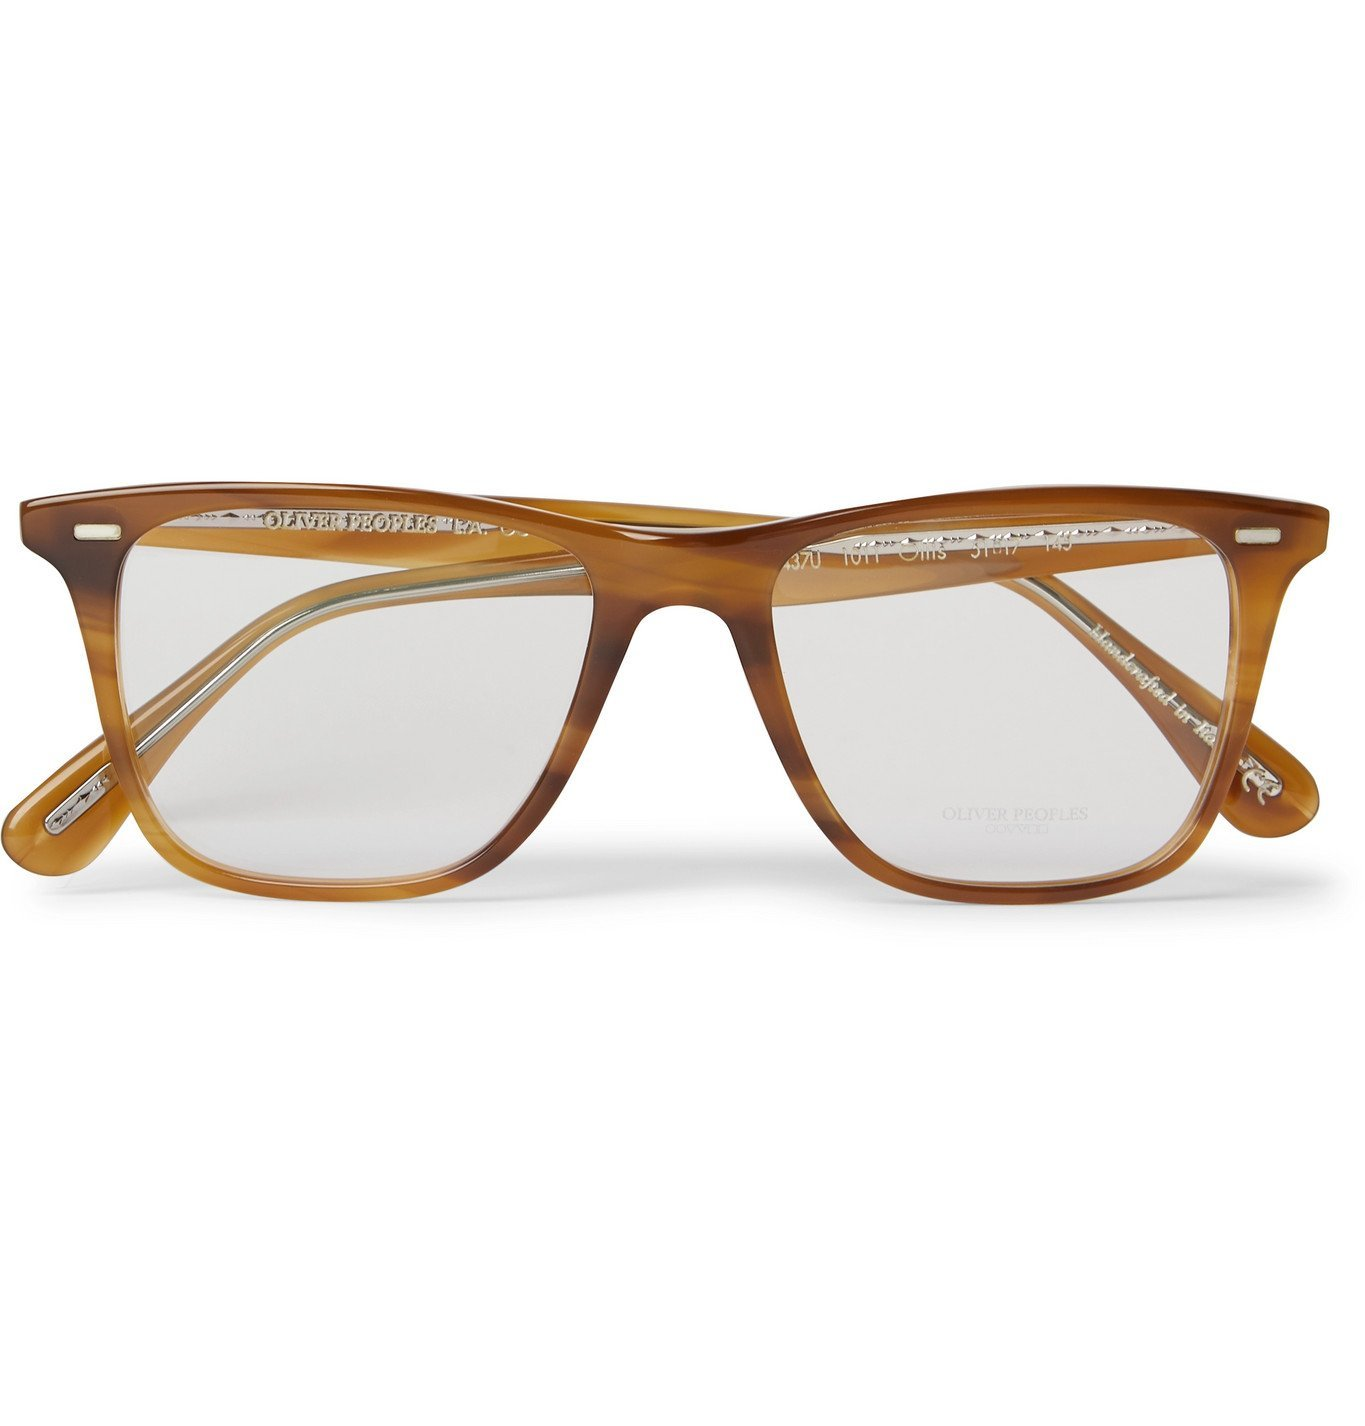 OLIVER PEOPLES - Ollis Square-Frame Acetate Optical Glasses - Brown